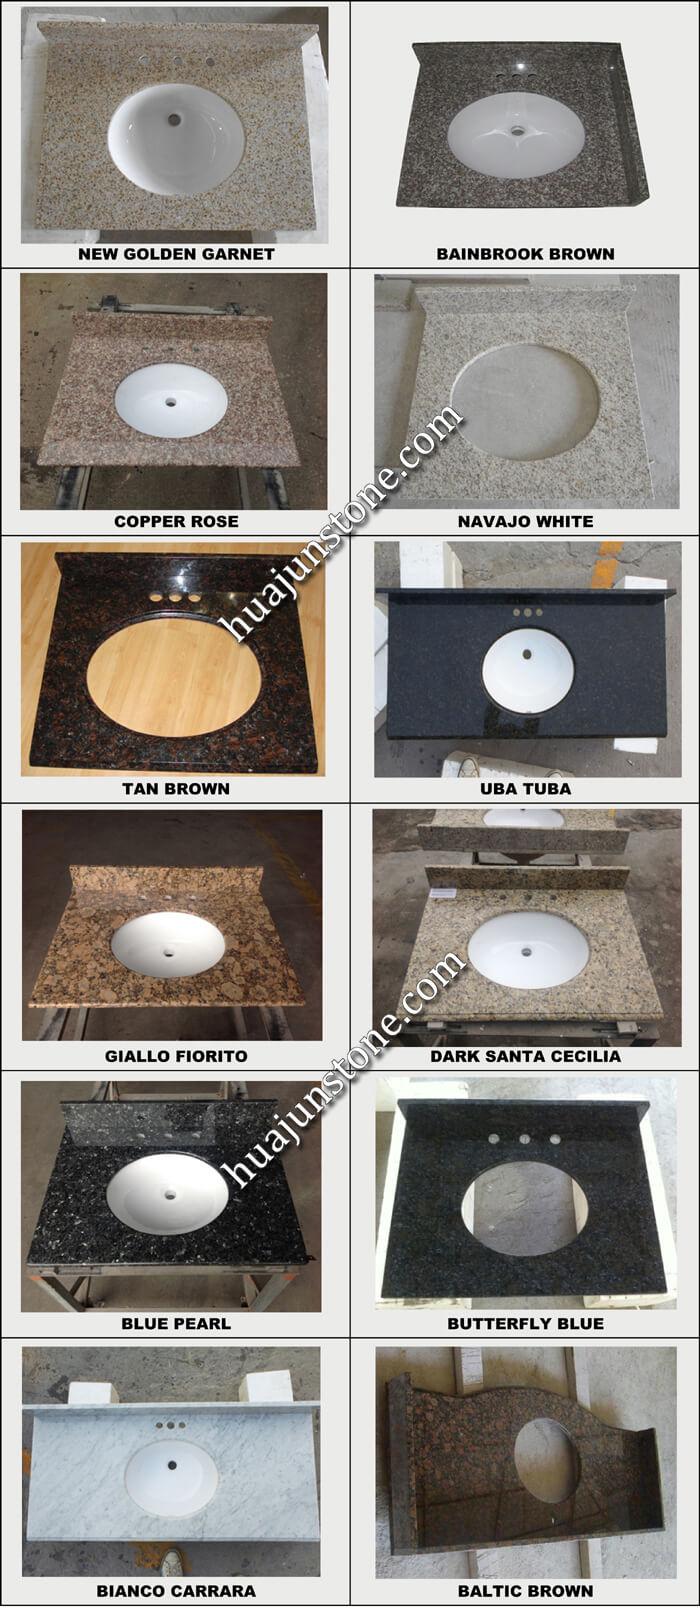 Hot Sale Products Of Bathroom Vanity Tops